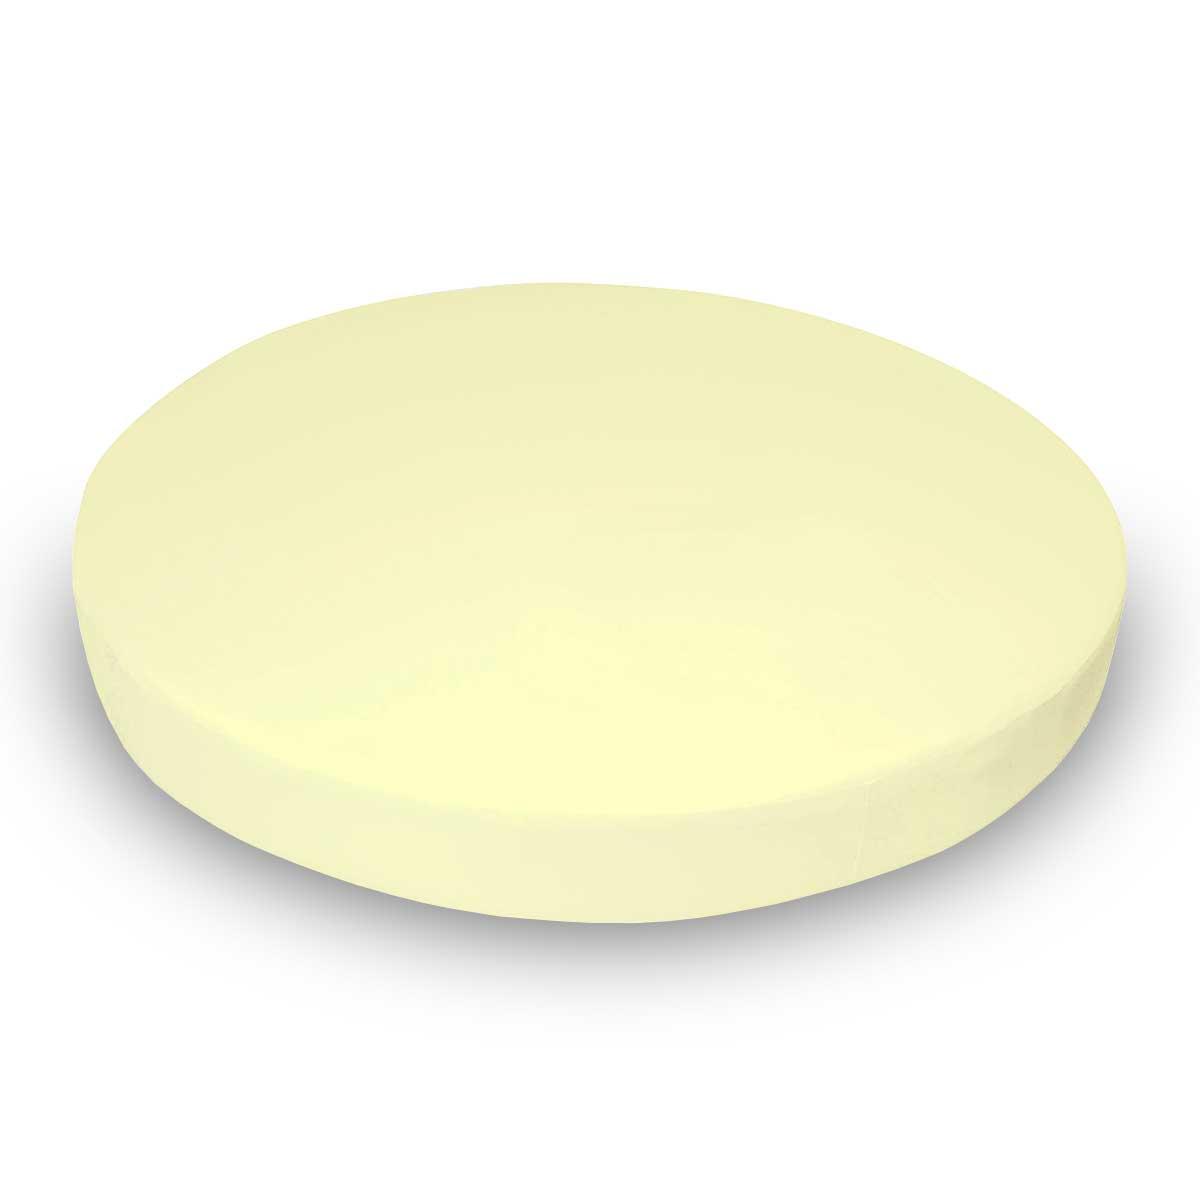 Flannel FS5 - Yellow